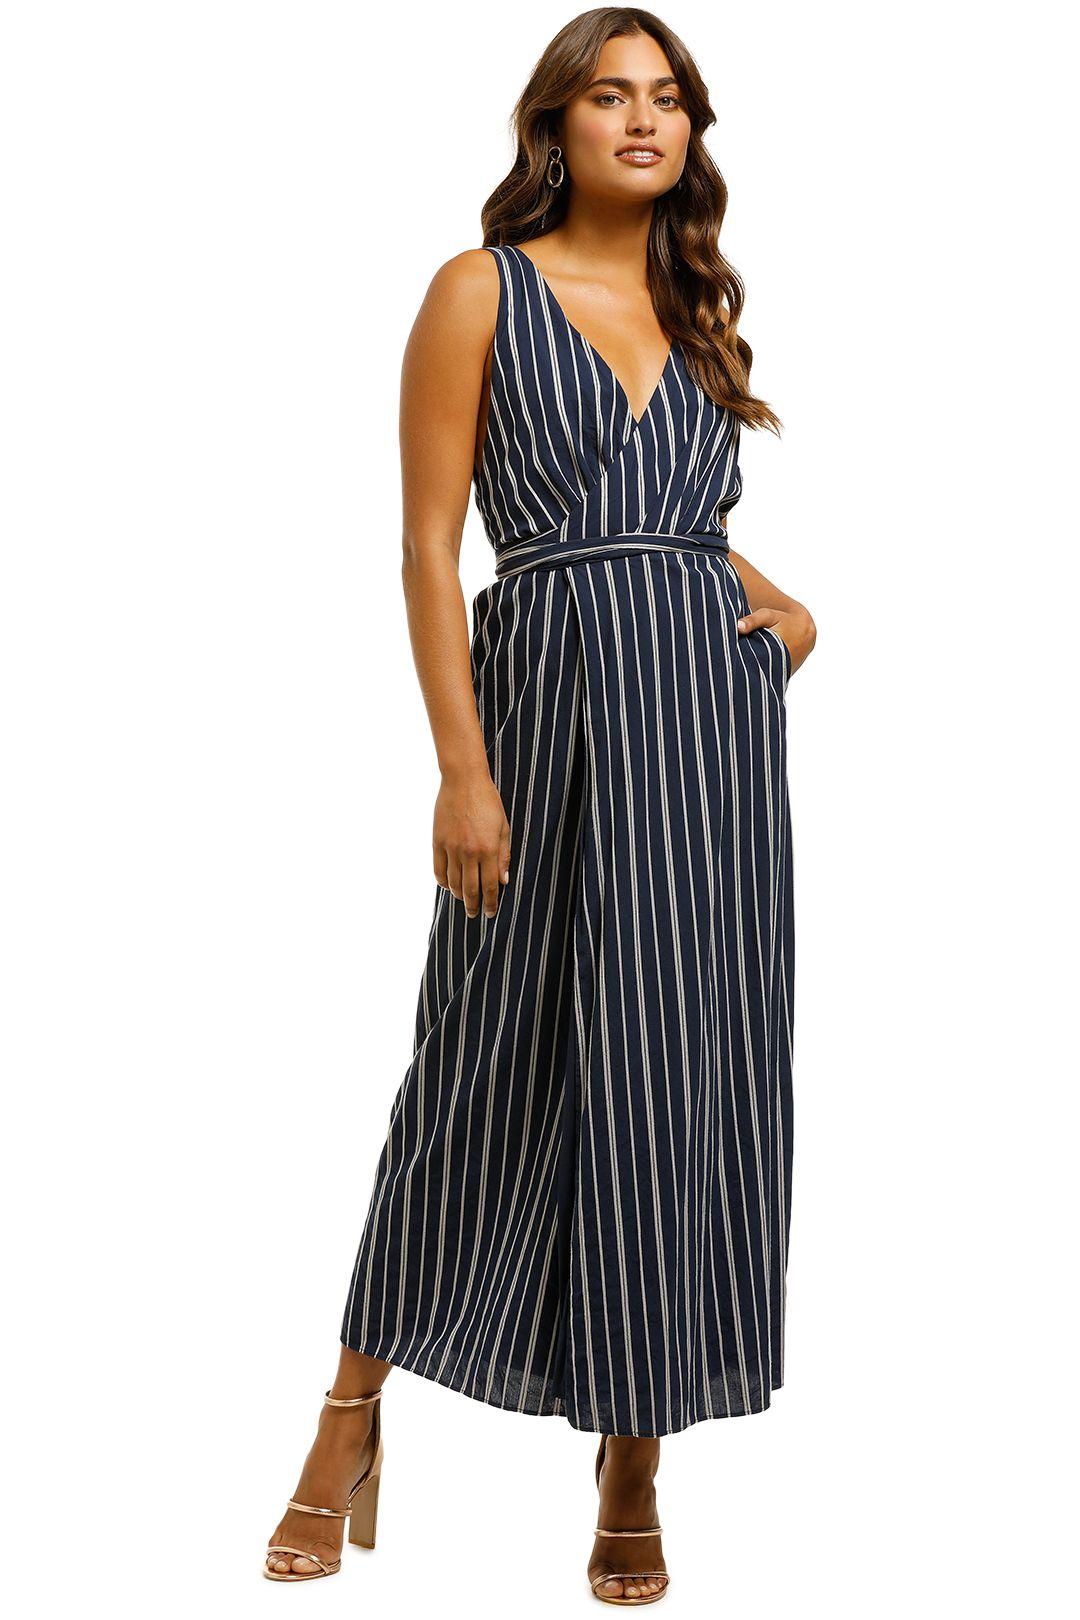 The Jetset Diaries - Kensington Midi Wrap Dress - Navy - Front